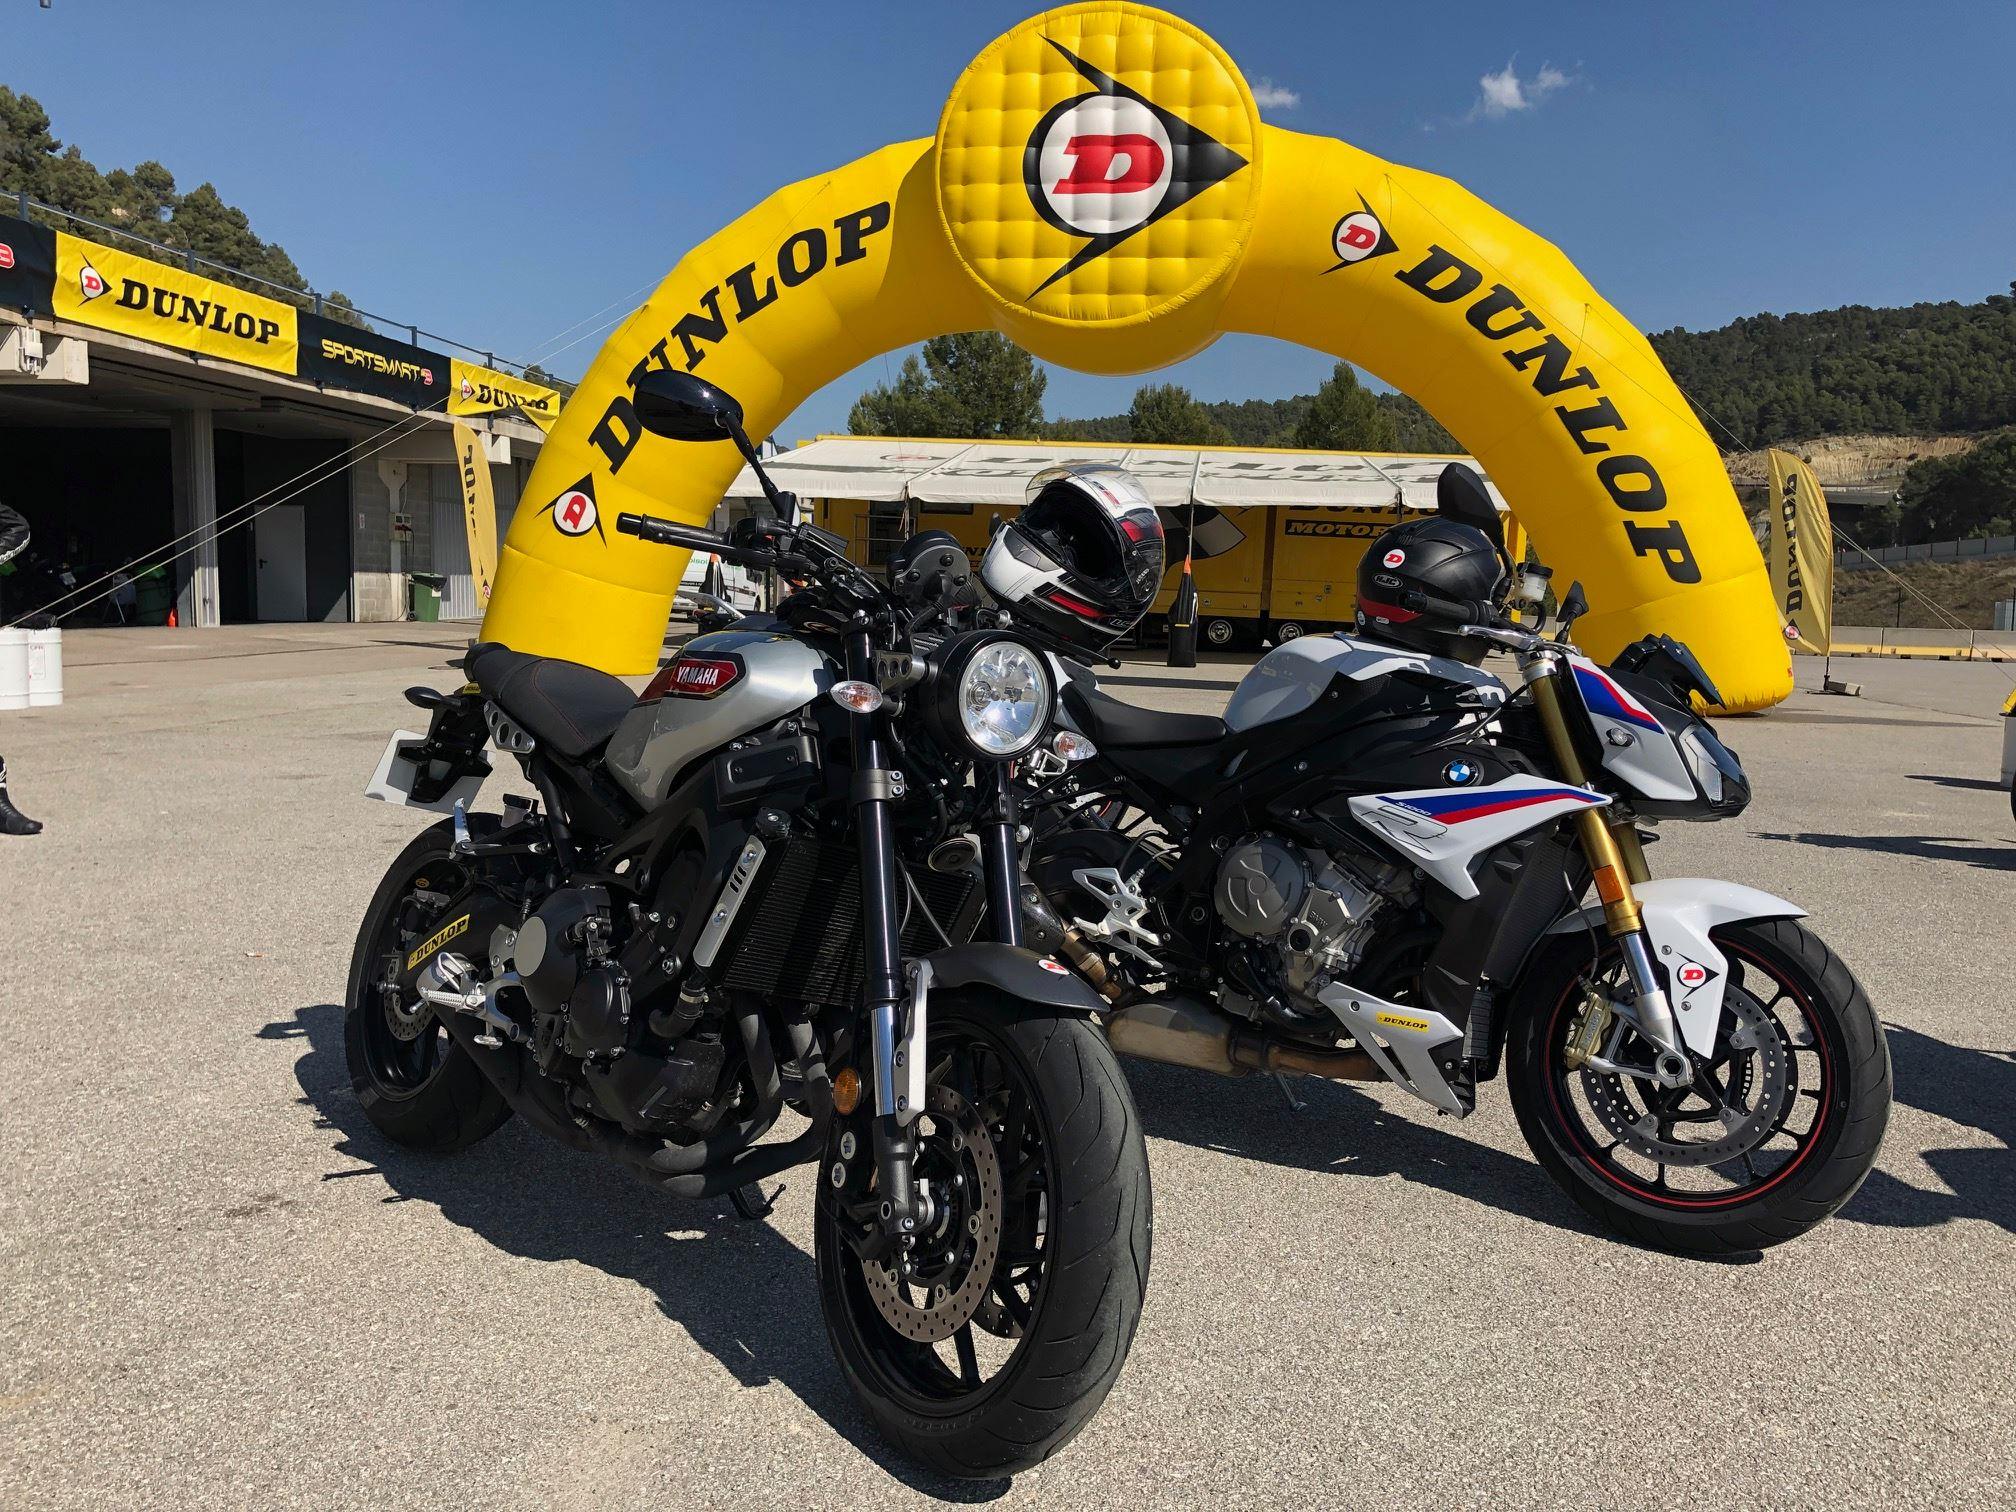 Dunlop SportSmart Mk3.